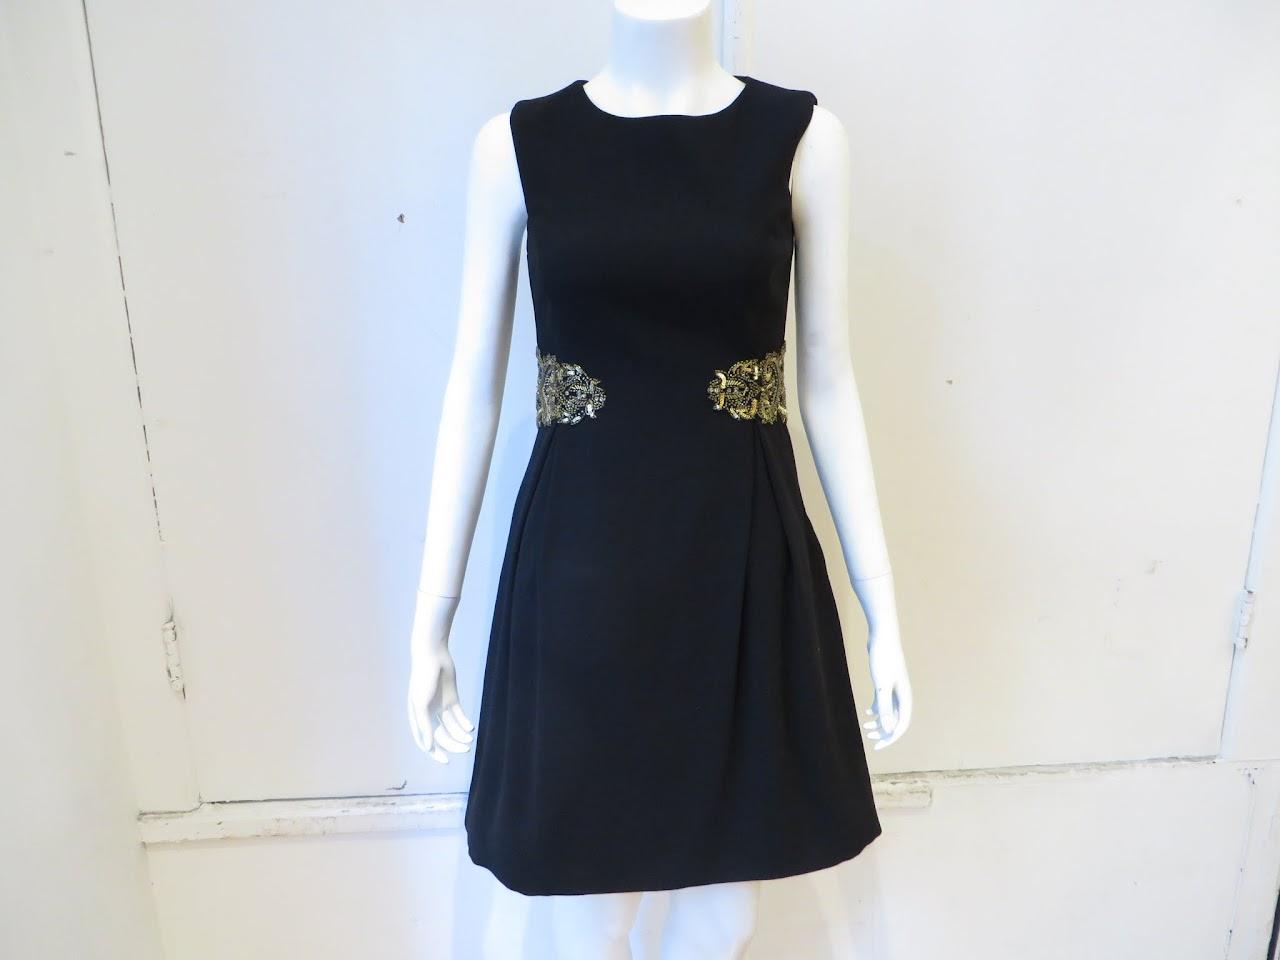 ML Monique Lhuillier Blacked Beaded Cocktail Dress